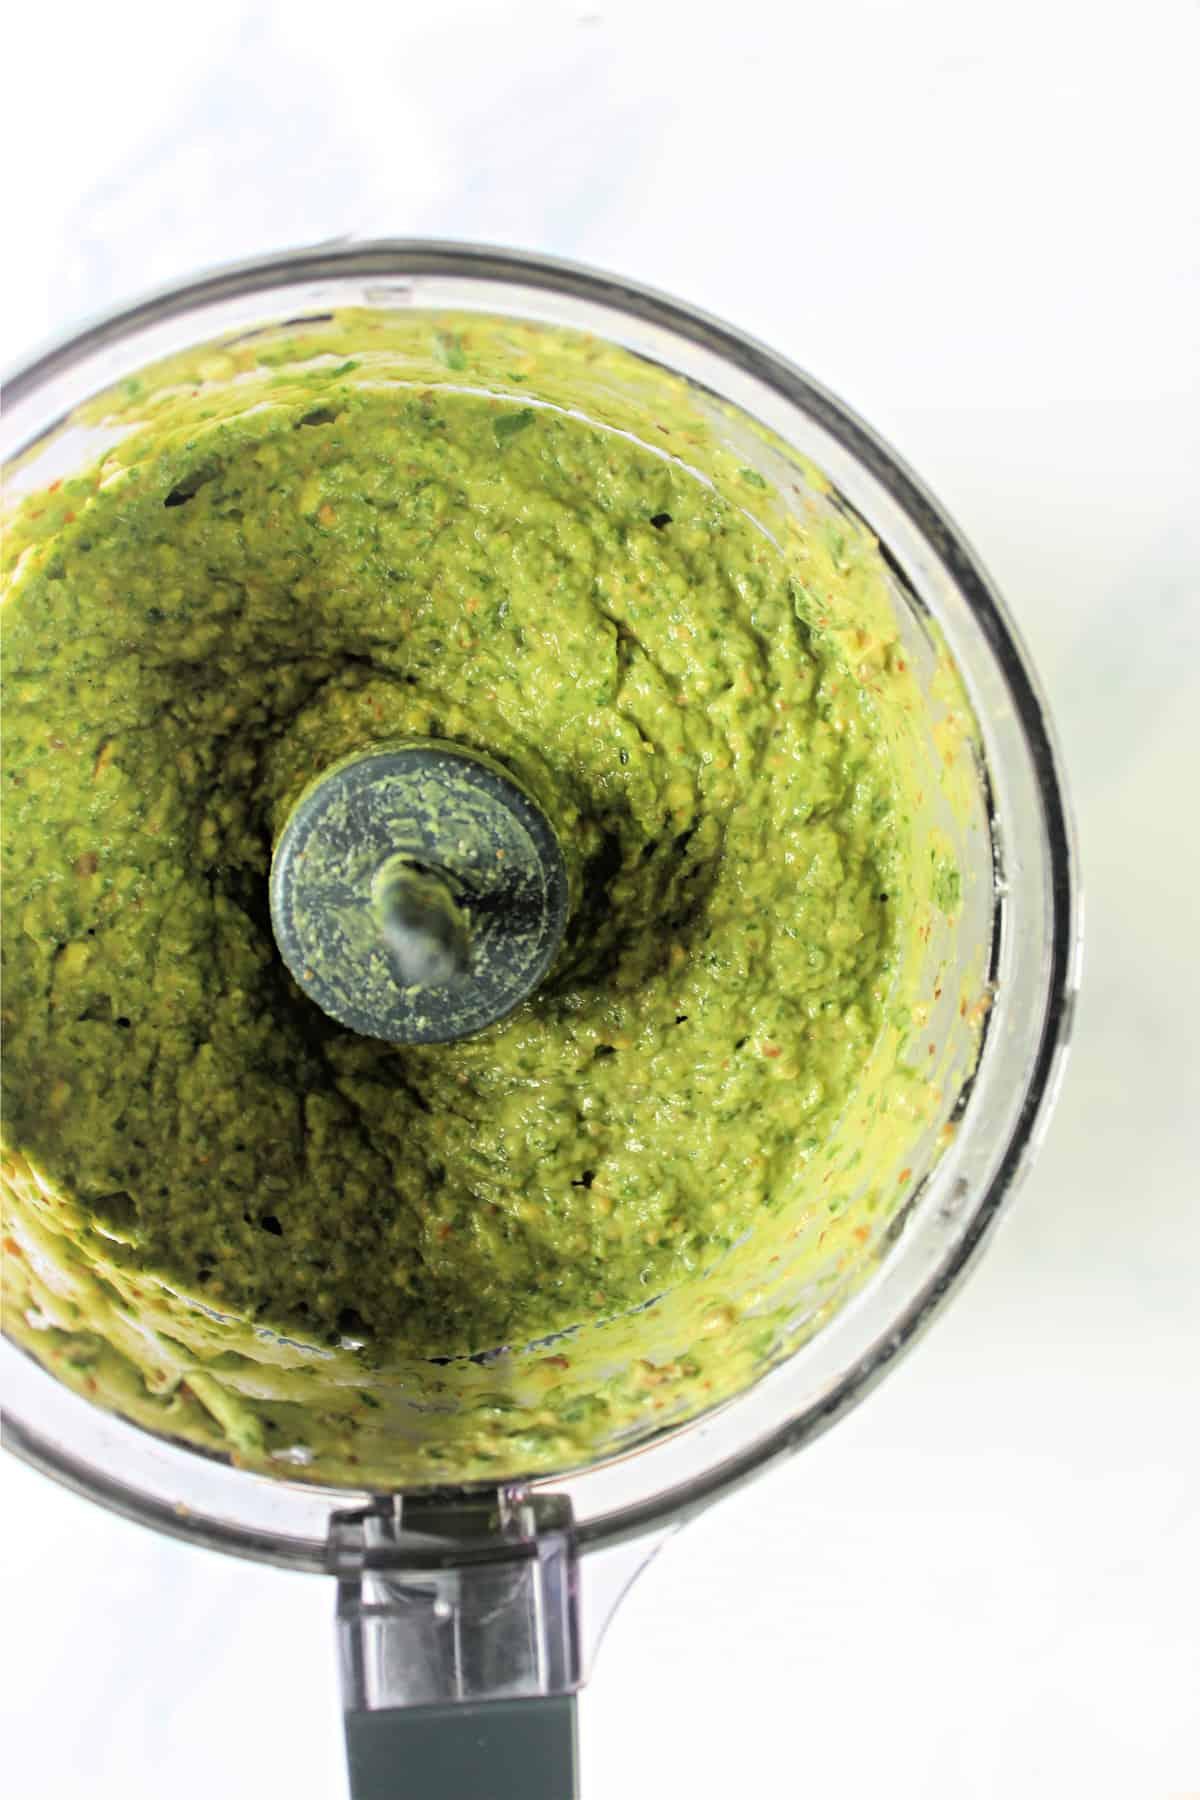 Overhead shot of avocado pesto in bowl of food processor.